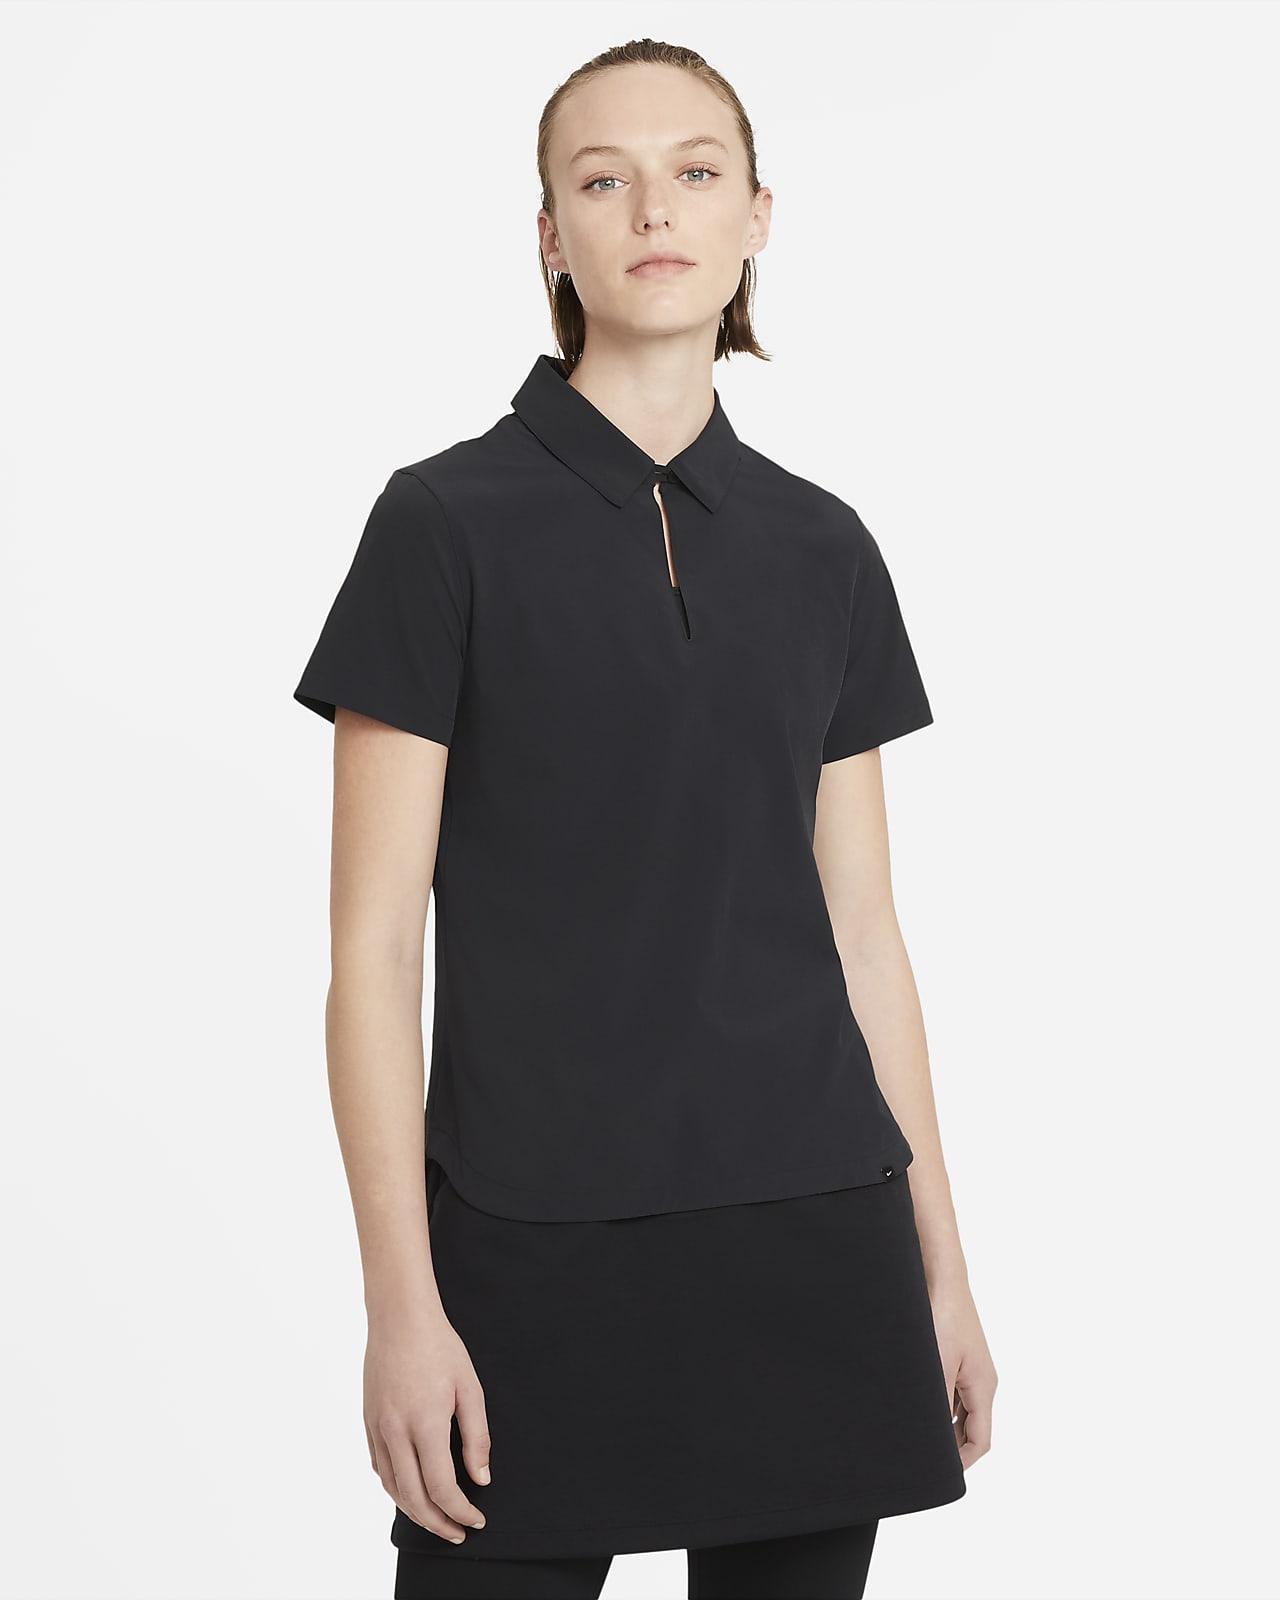 Nike Flex Ace Golf-Poloshirt für Damen